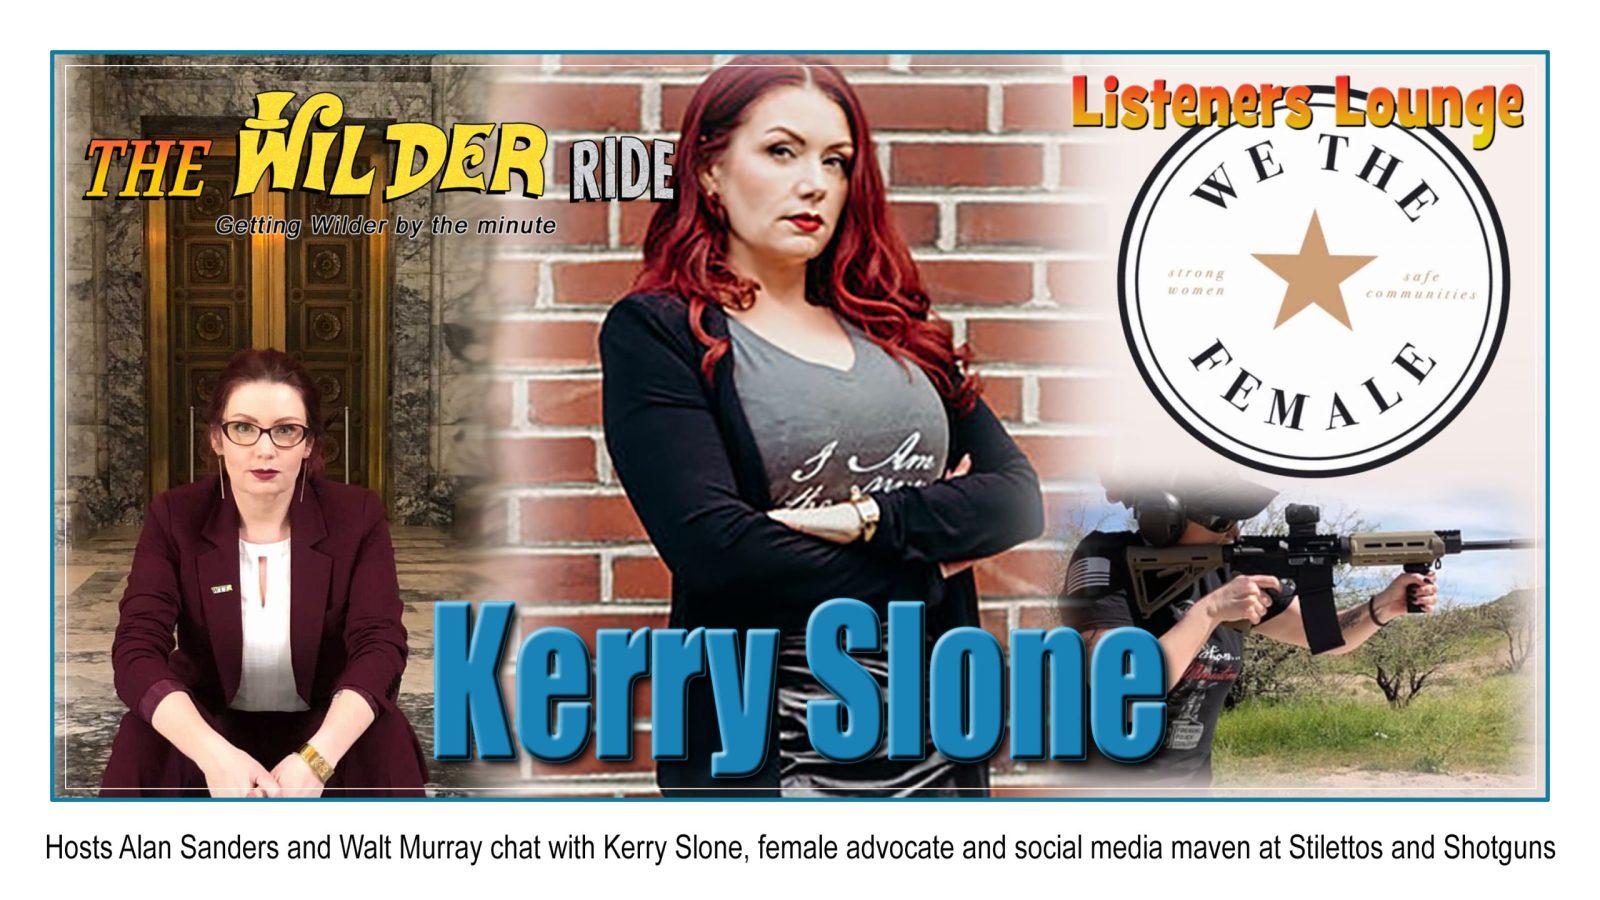 Kerry Slone